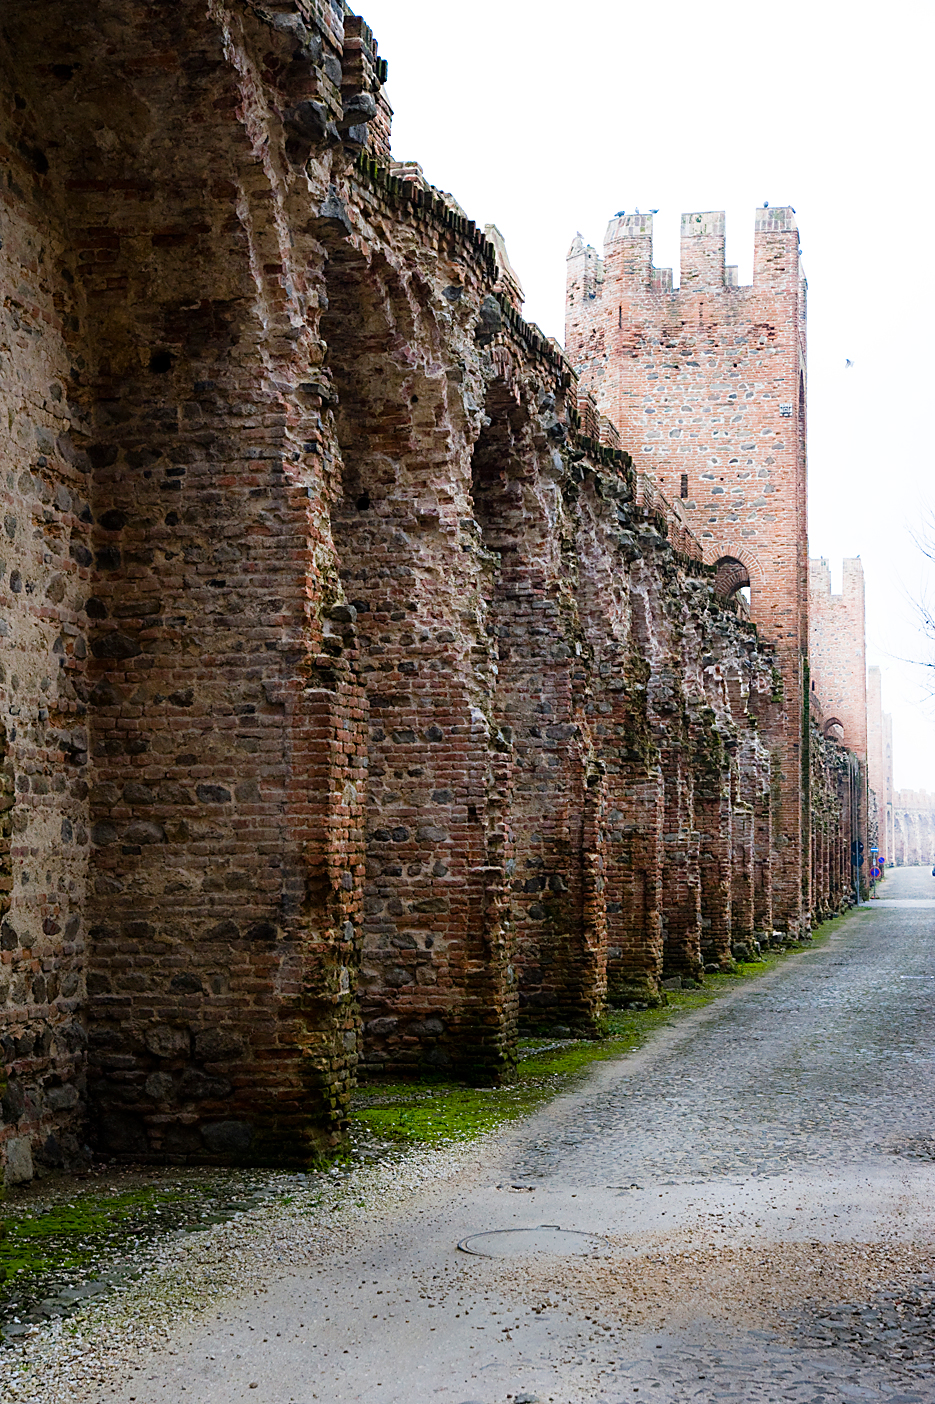 San Pietro Di Legnago Verona elevation of san pietro di legnago, via giuseppe randazzo, 2